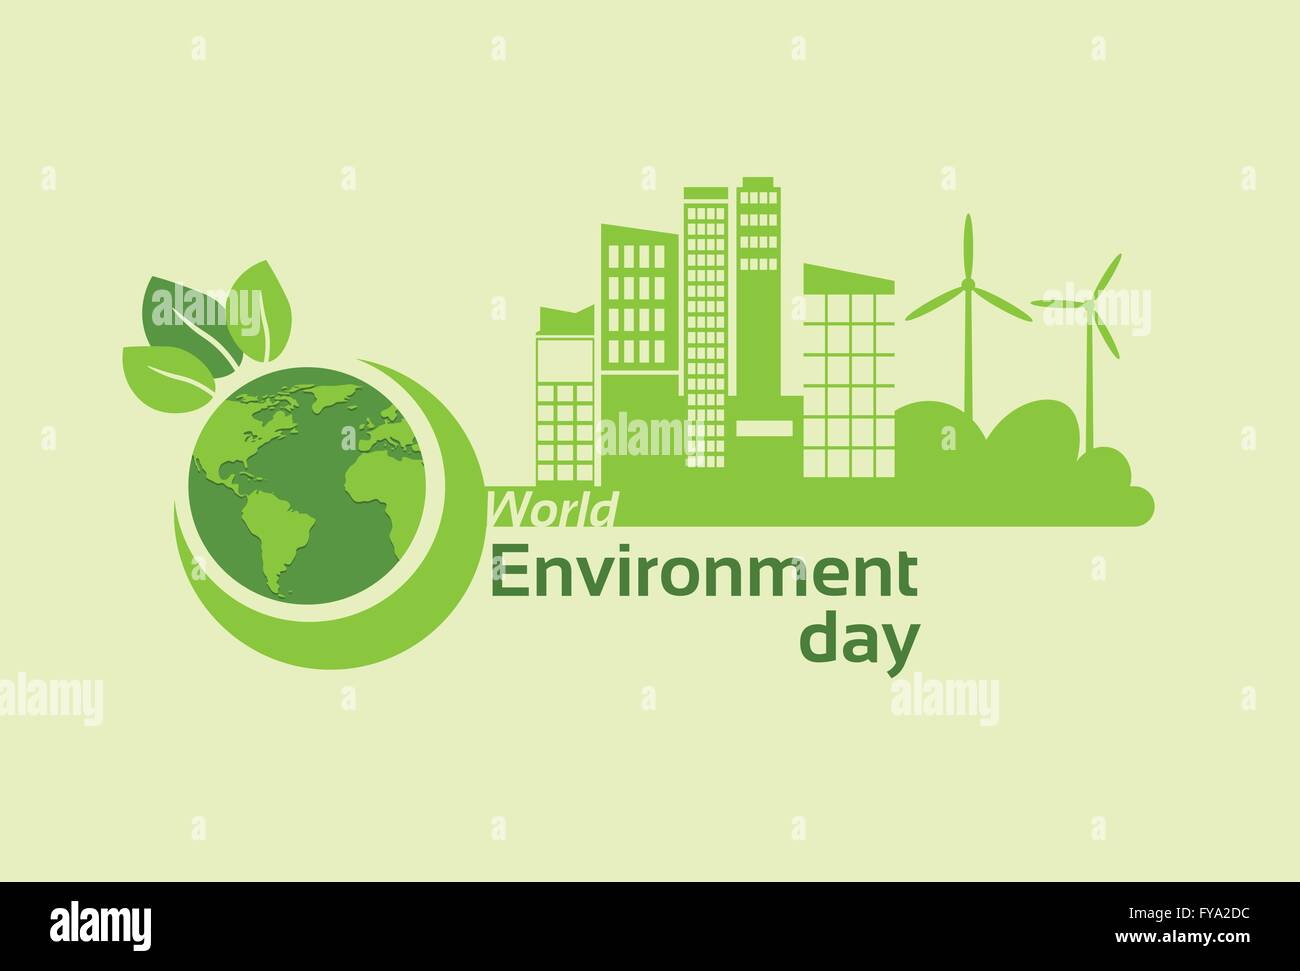 Green City Earth Planet Globe Silhouette Wind Turbine